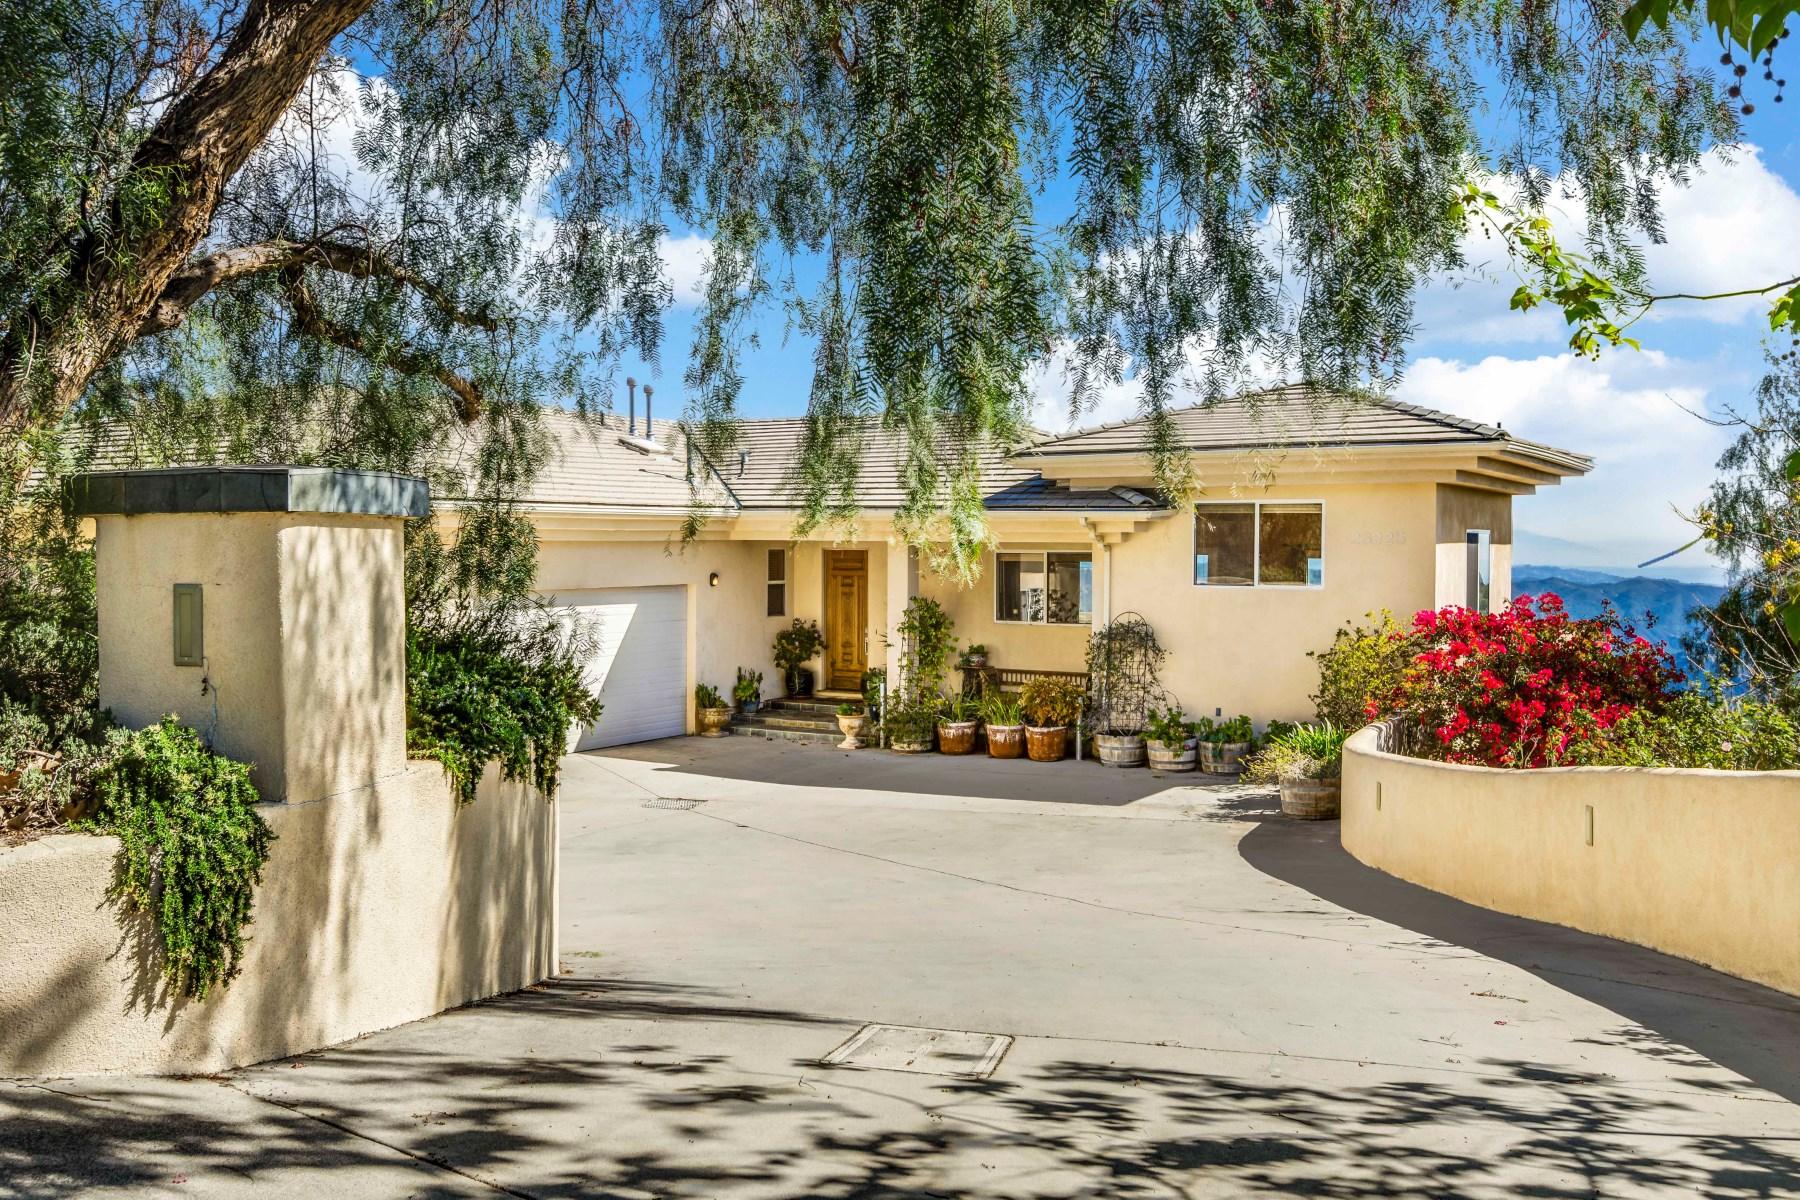 Casa Unifamiliar por un Venta en Ocean and City Light Views 23225 Saddle Peak Road Topanga, California 90290 Estados Unidos